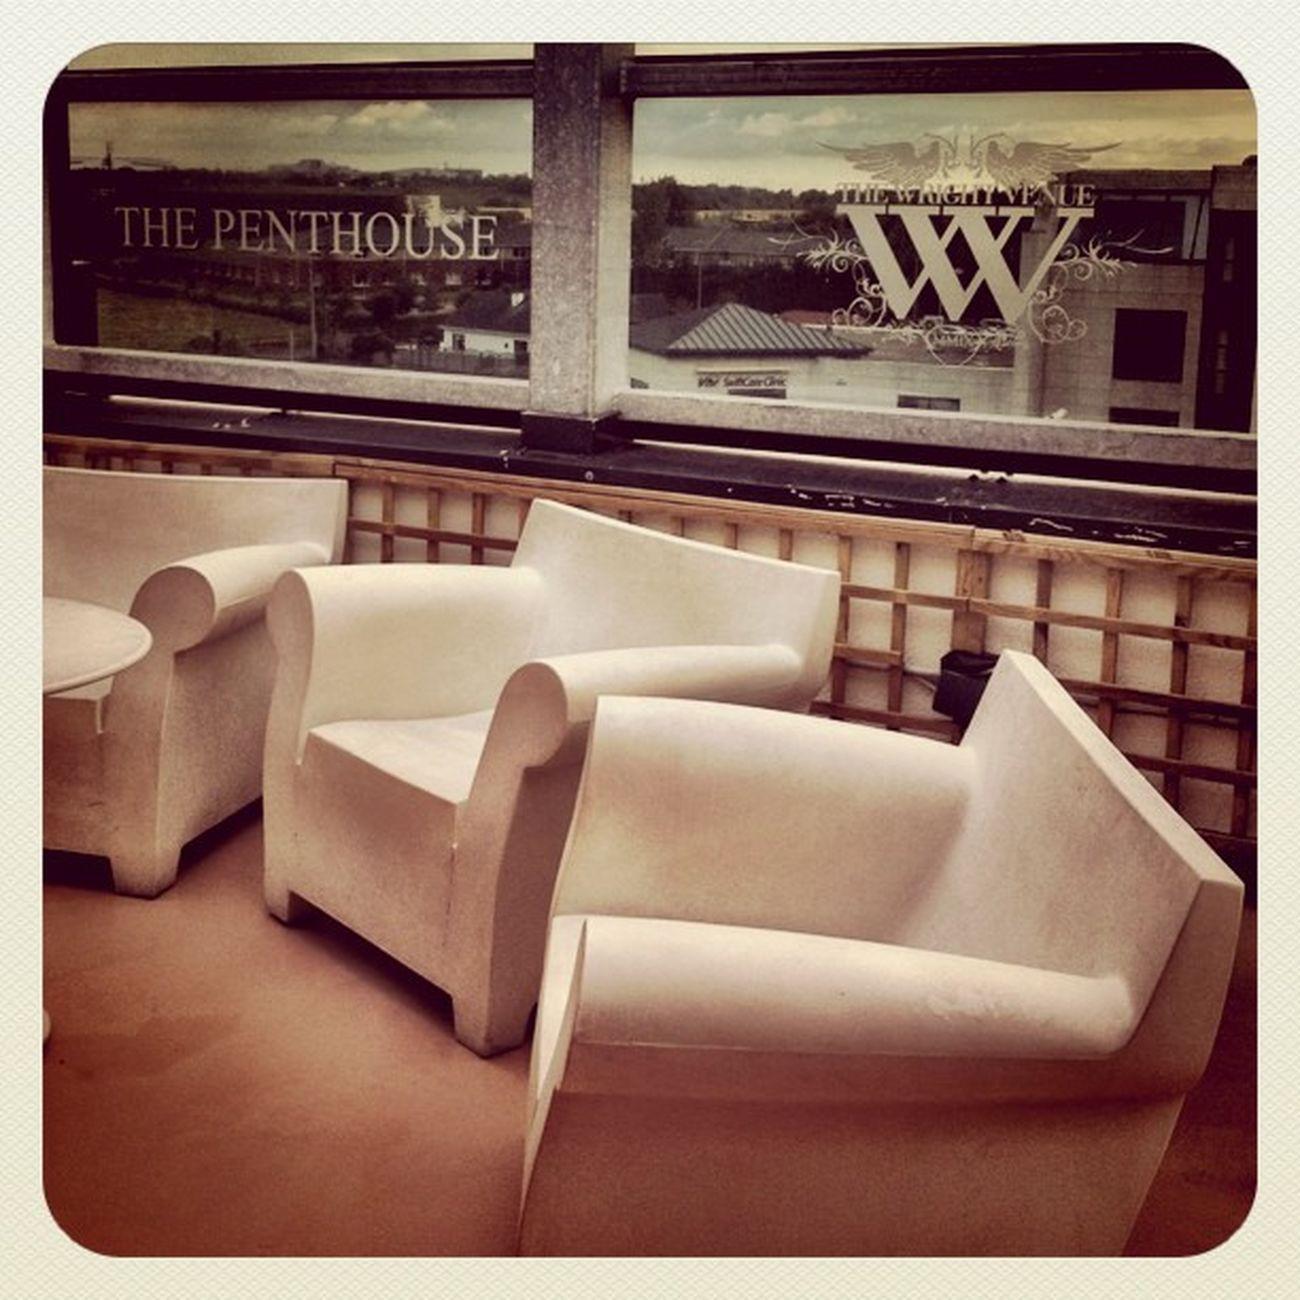 The Penthouse ? #jj #jj_forum #earlybirdlove Popular Jj  Earlybirdlove Jj_forum Popularpage Alaniskopop